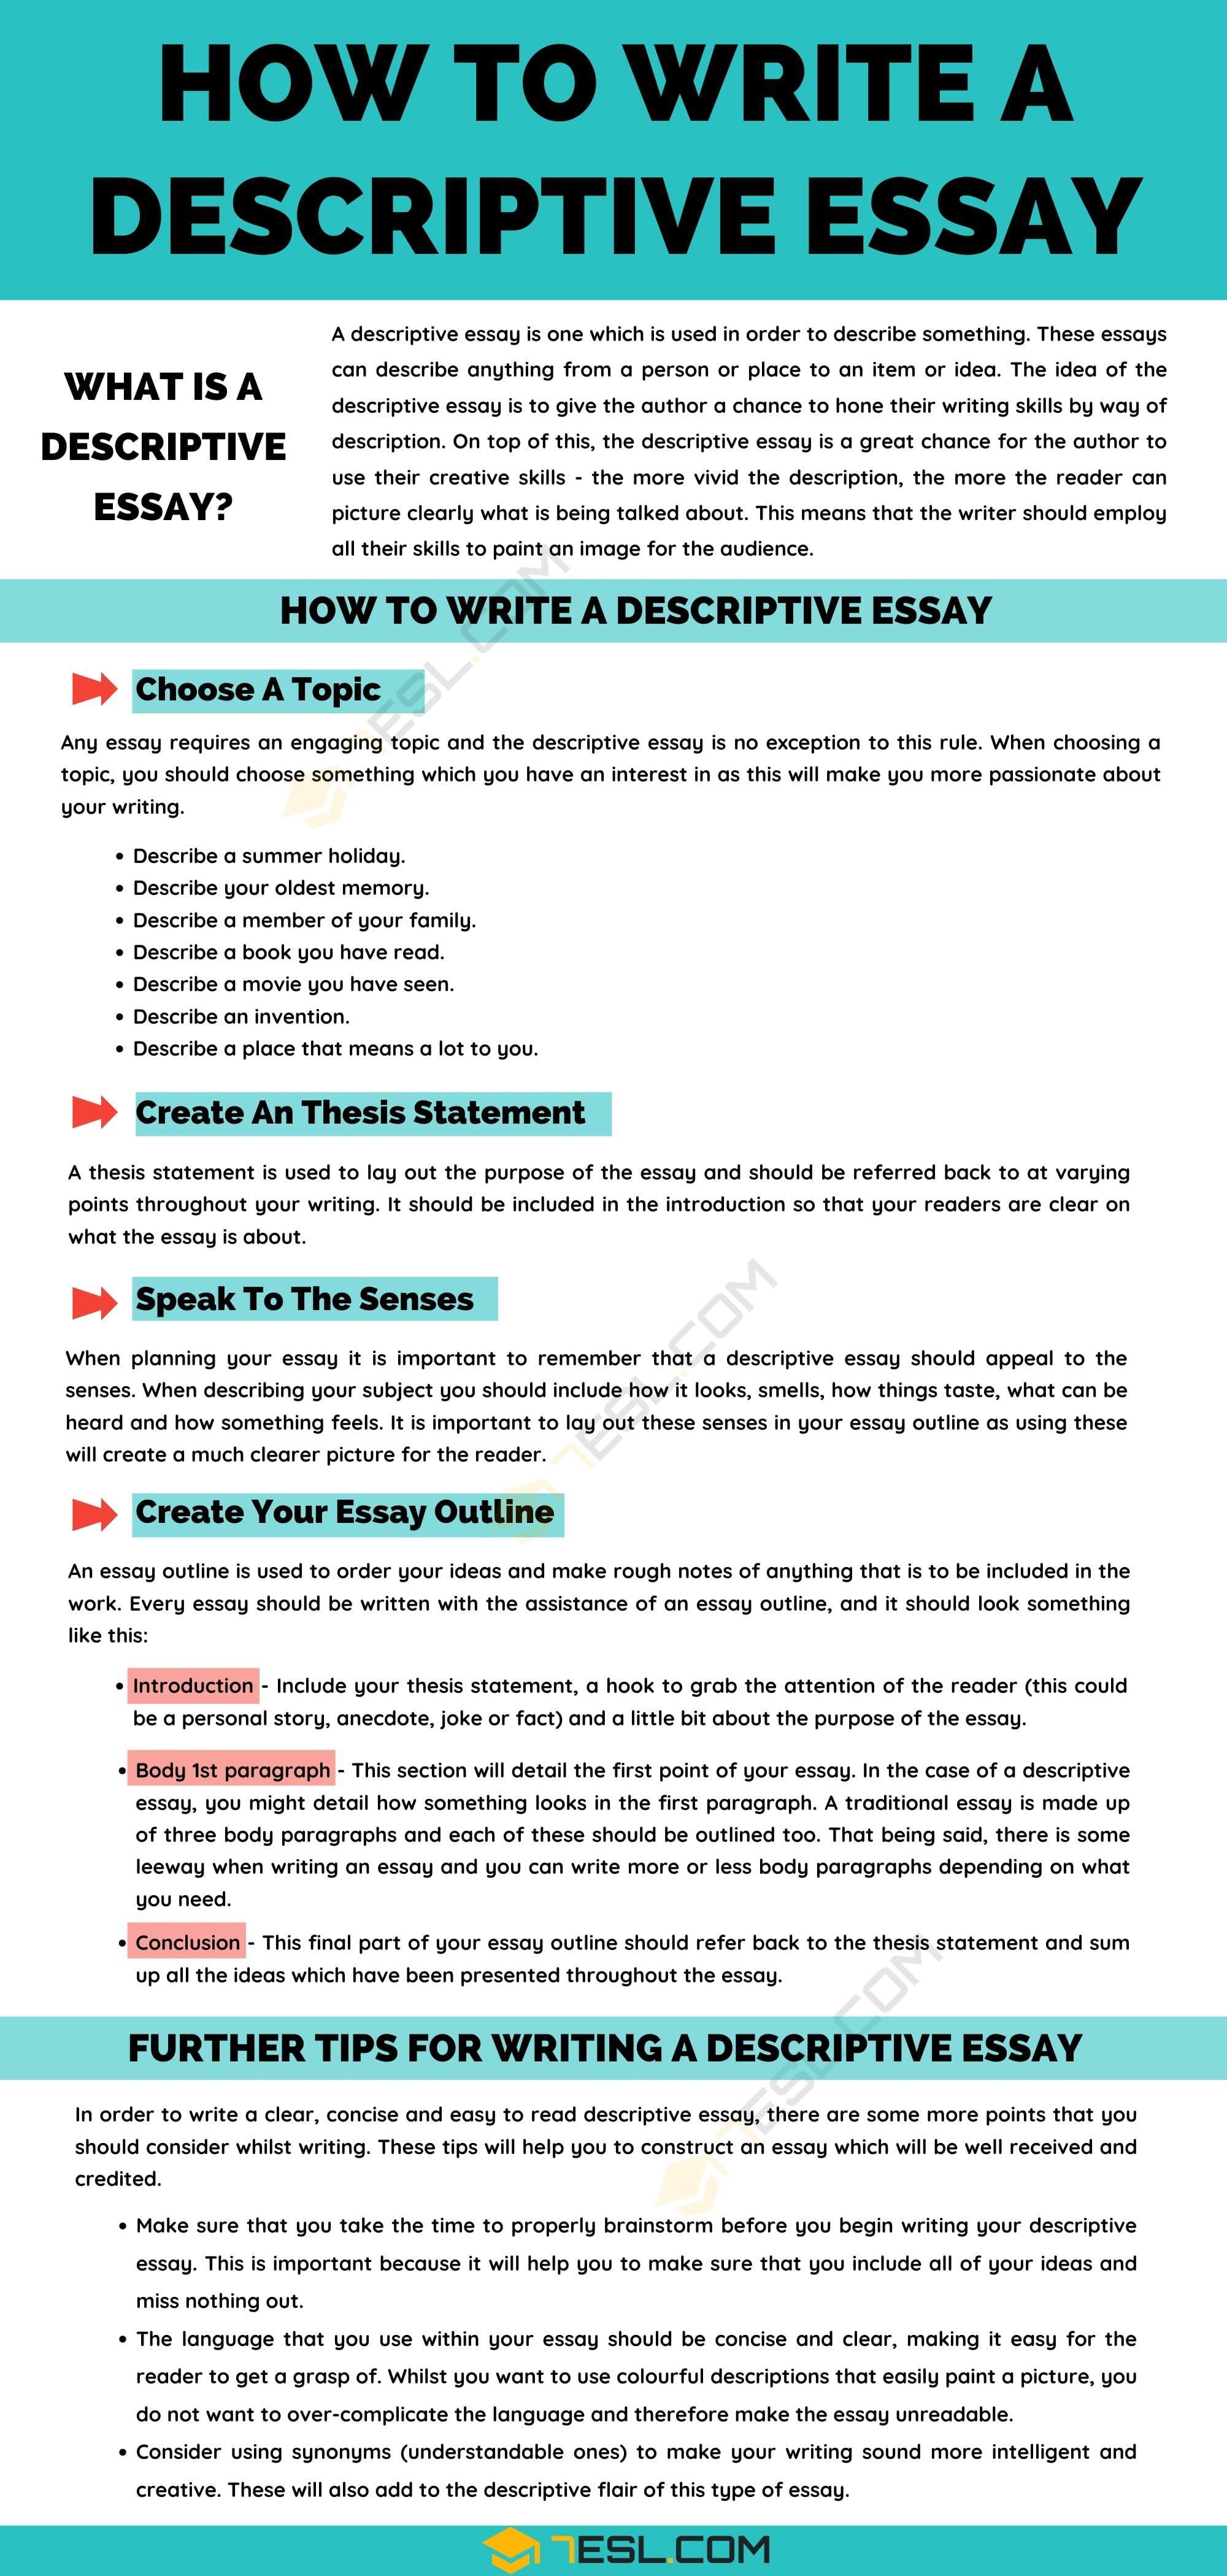 Descriptive Essay Definition Example Tip For Writing A 7esl Skill Book Tips Define